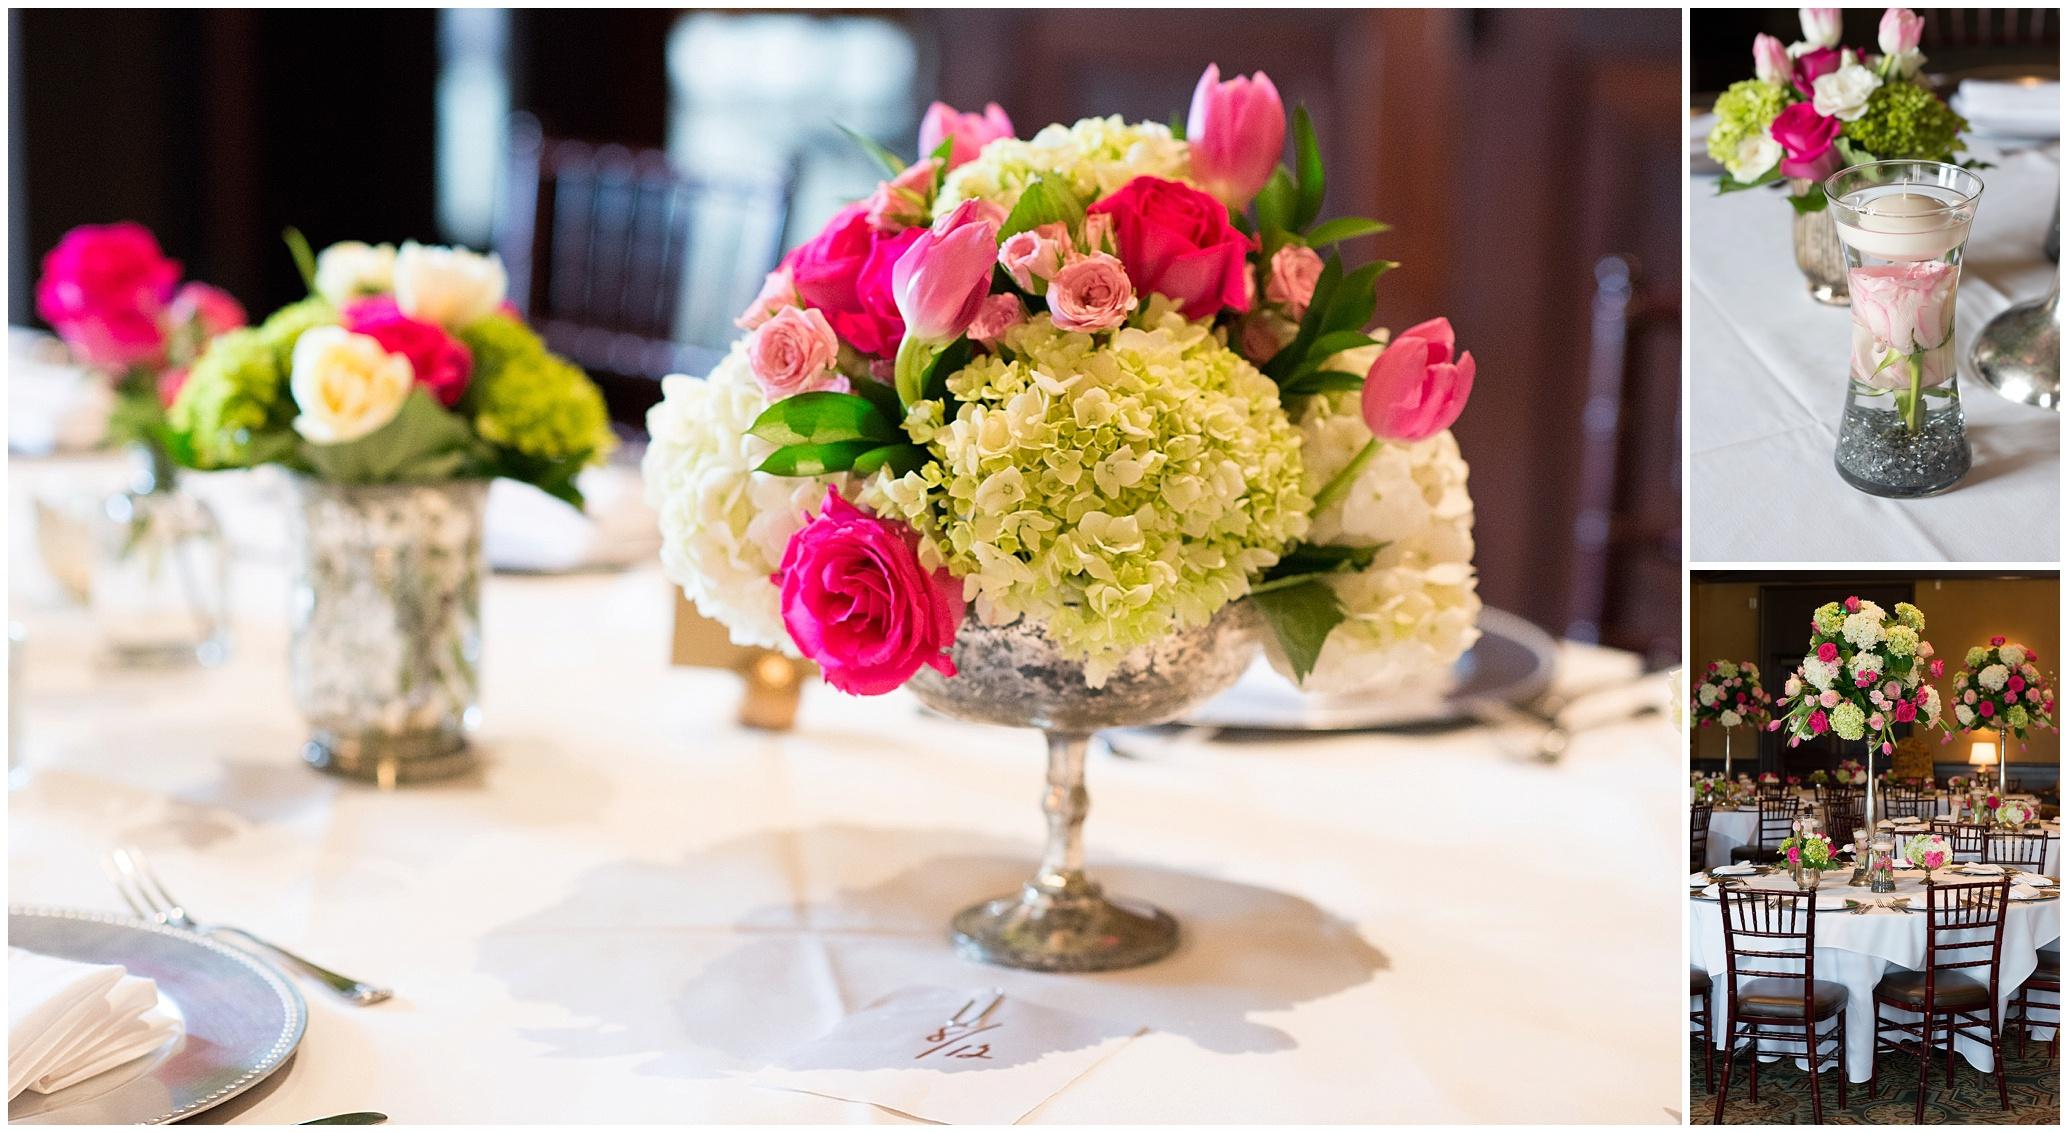 Kari Joe Tpc Sawgrass Ponte Vedra Wedding Florist